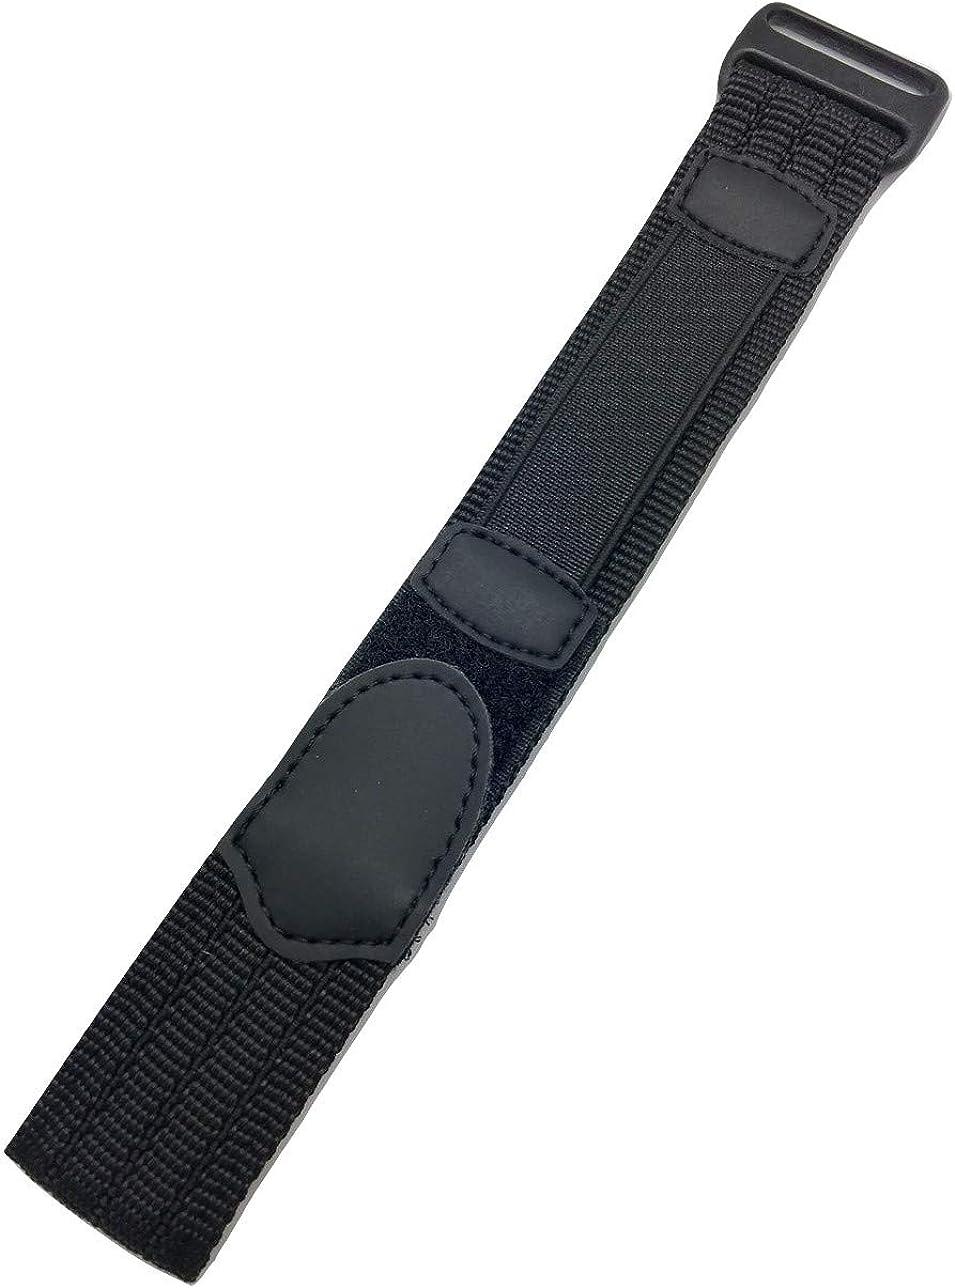 18-20mm Adjustable-Length, Black, Nylon Sport Watch Strap